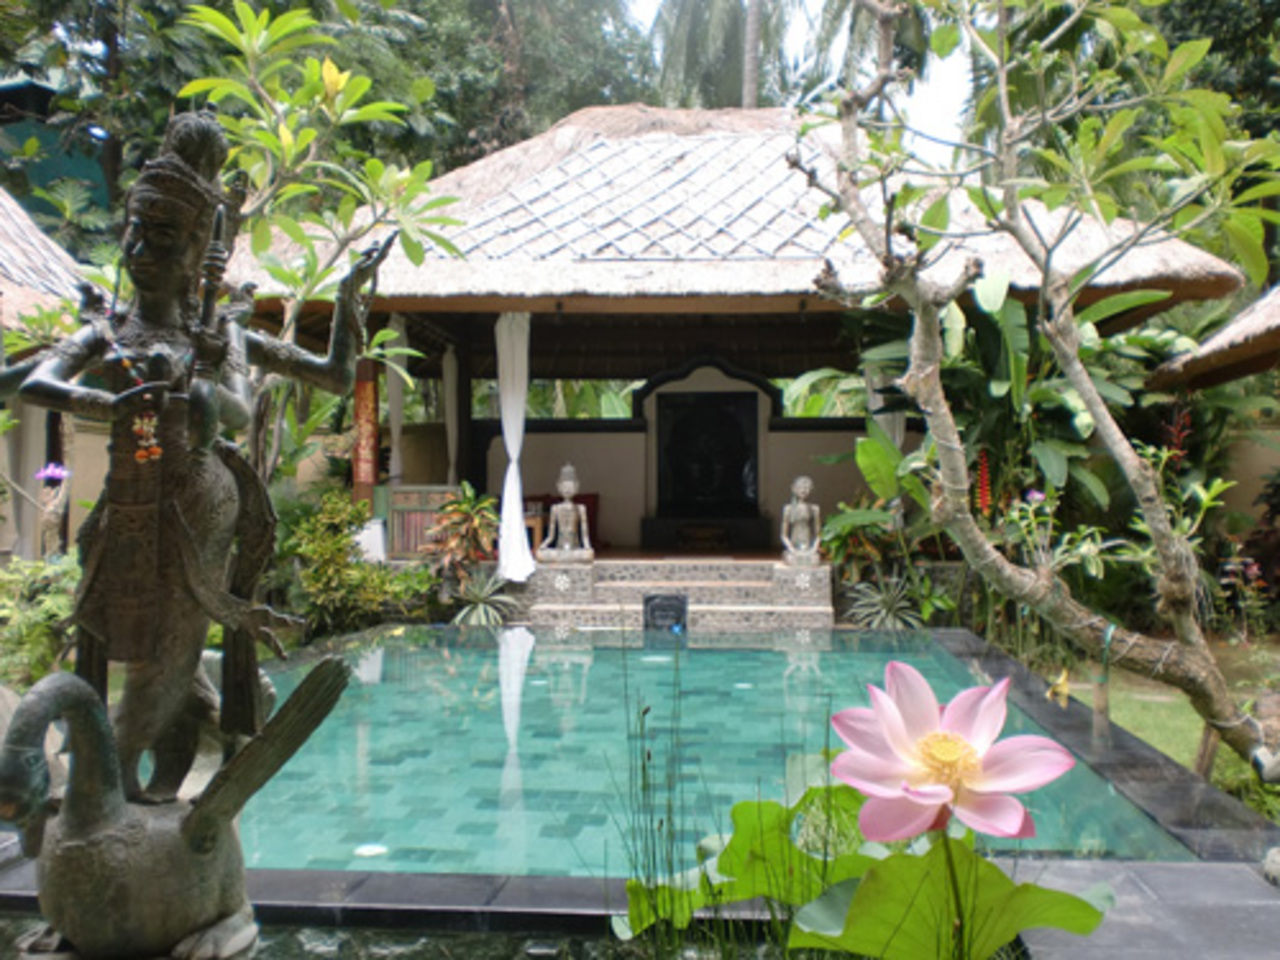 prana veda bali sanctuary center retreat guru